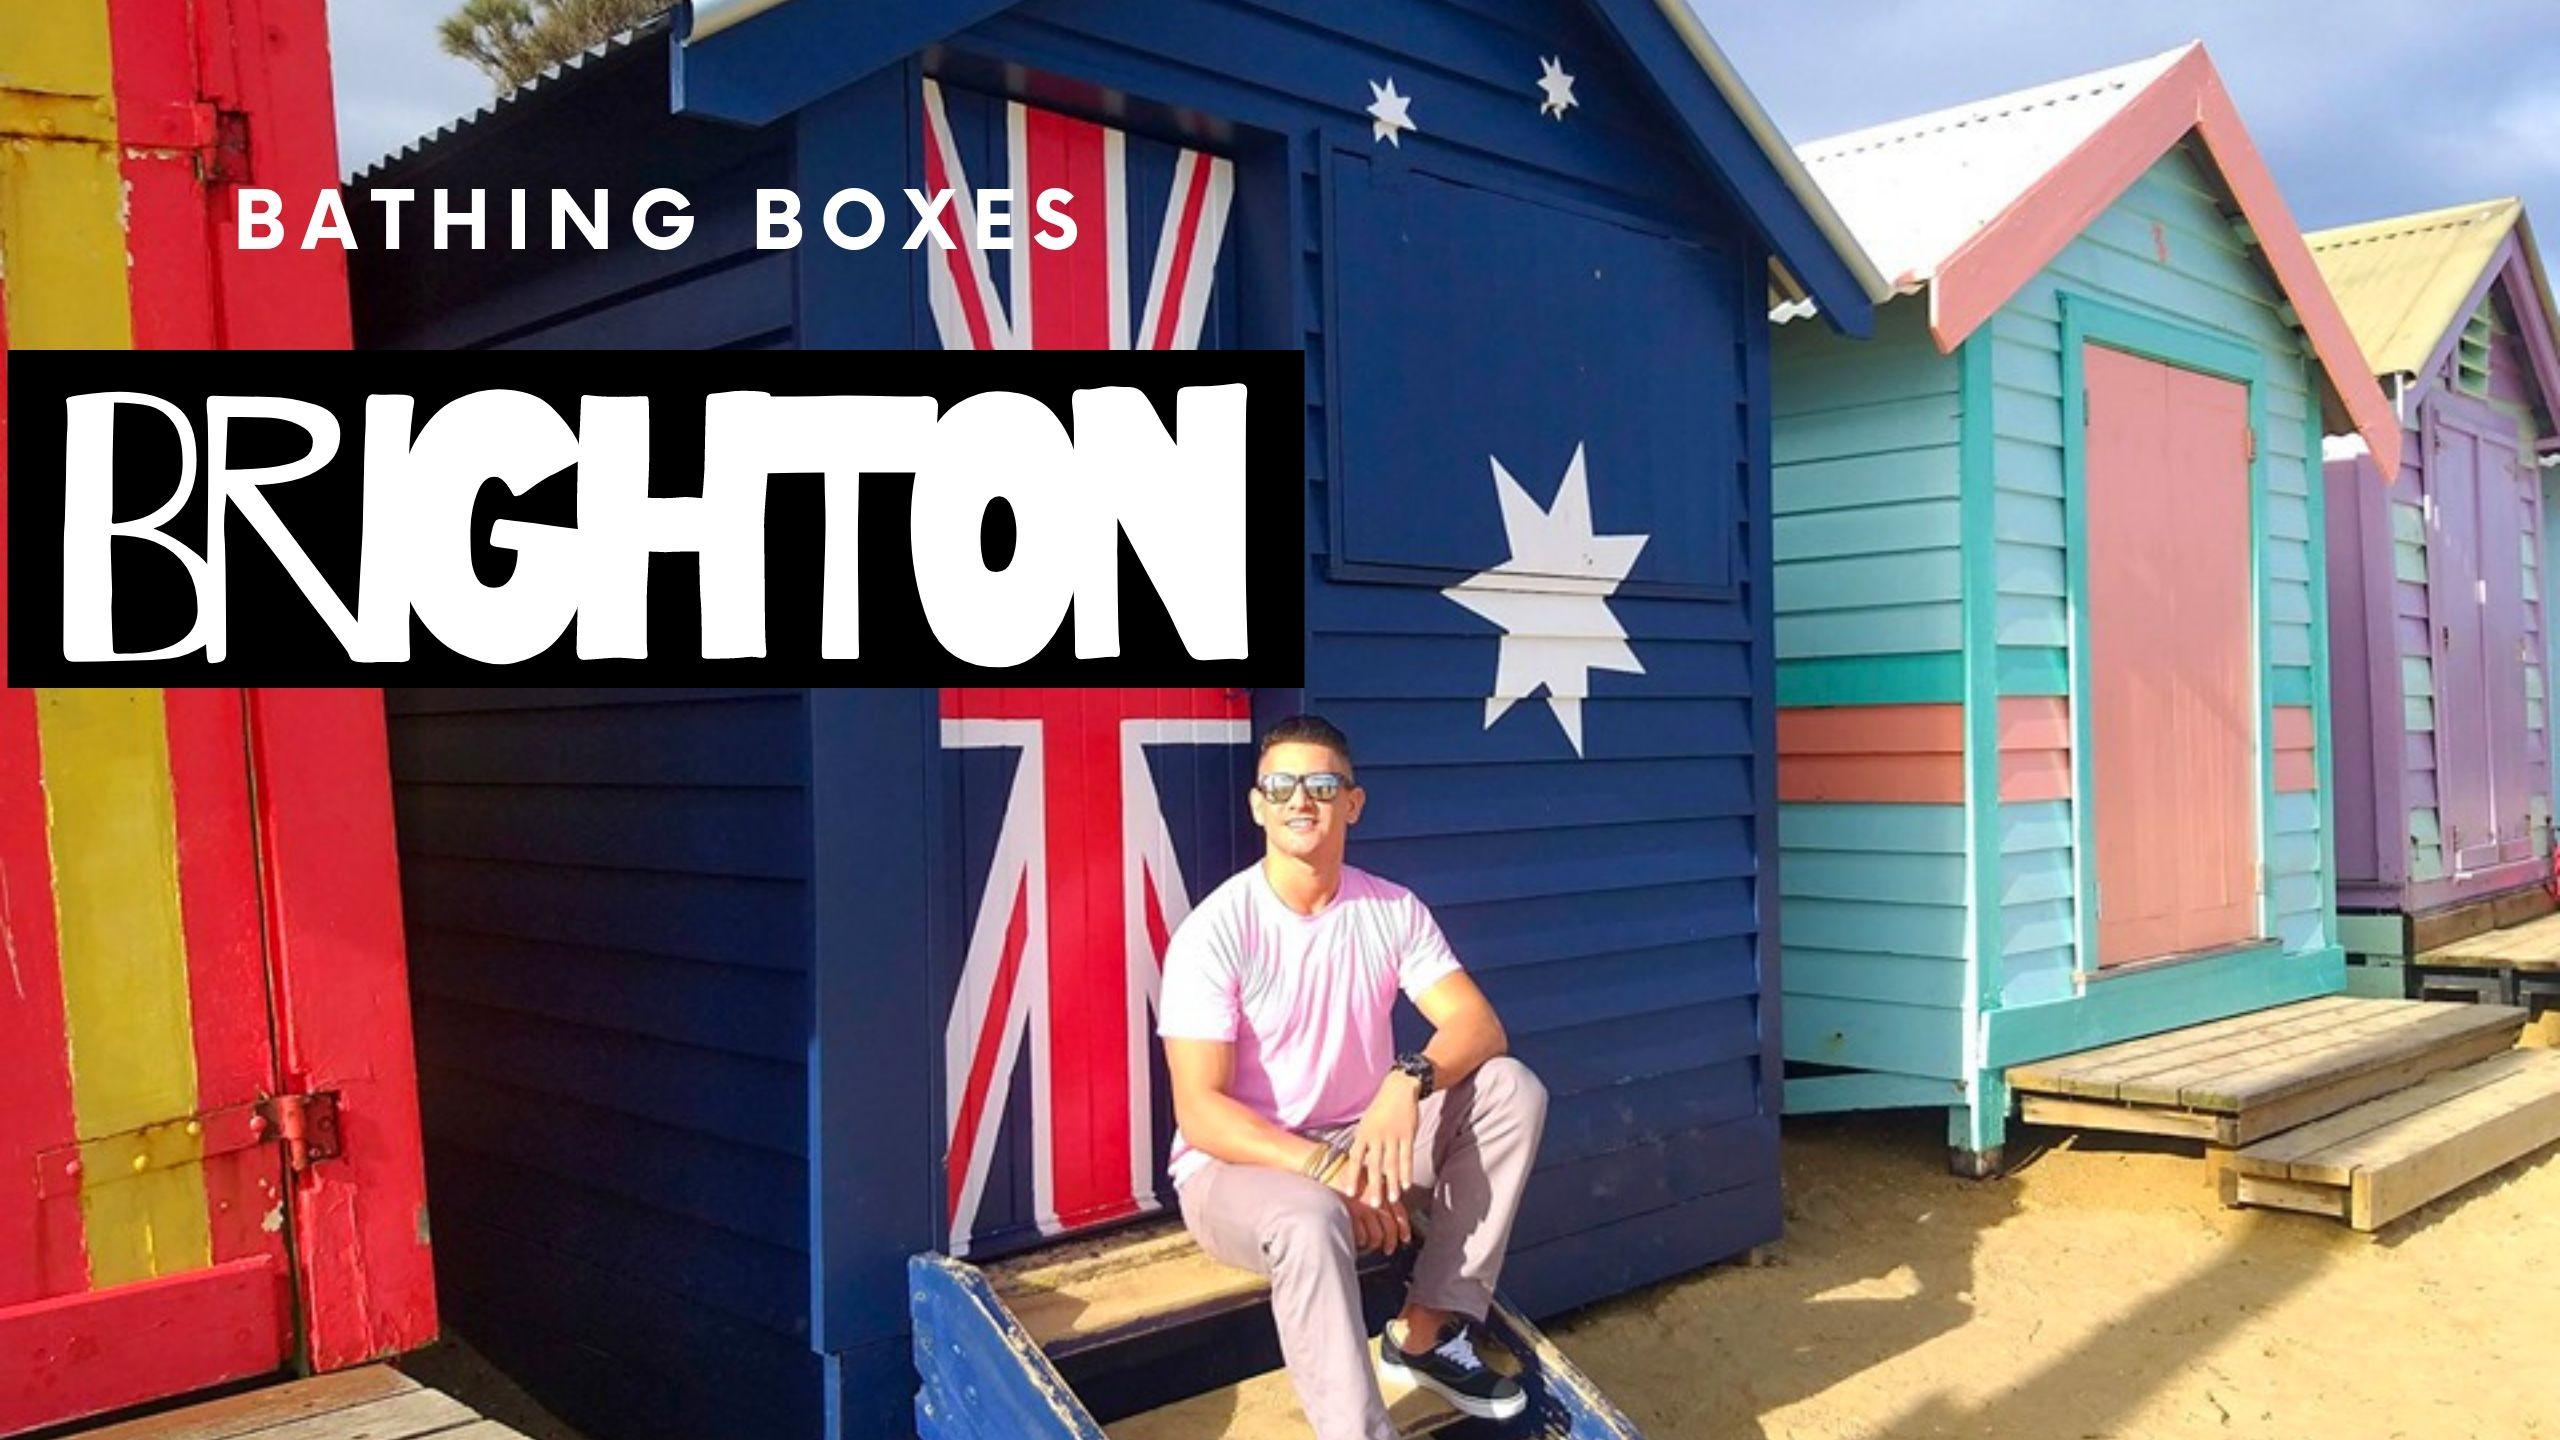 brighton bathing boxes, Brighton Bathing Boxes